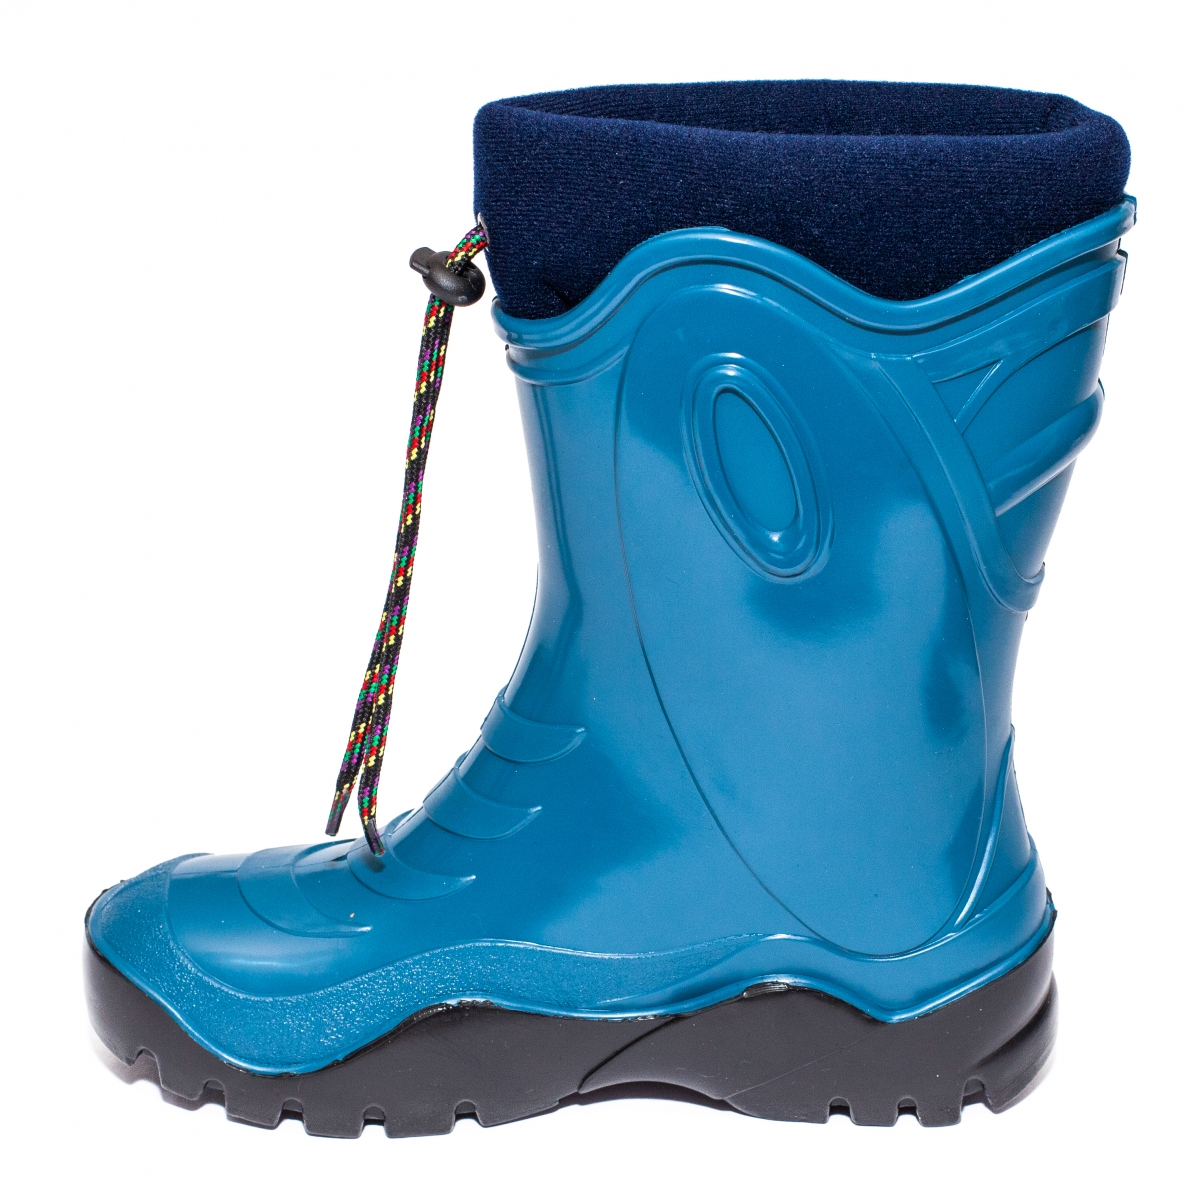 Cizme copii cauciuc cu blana iarna 4 turcoaz blu 24-39